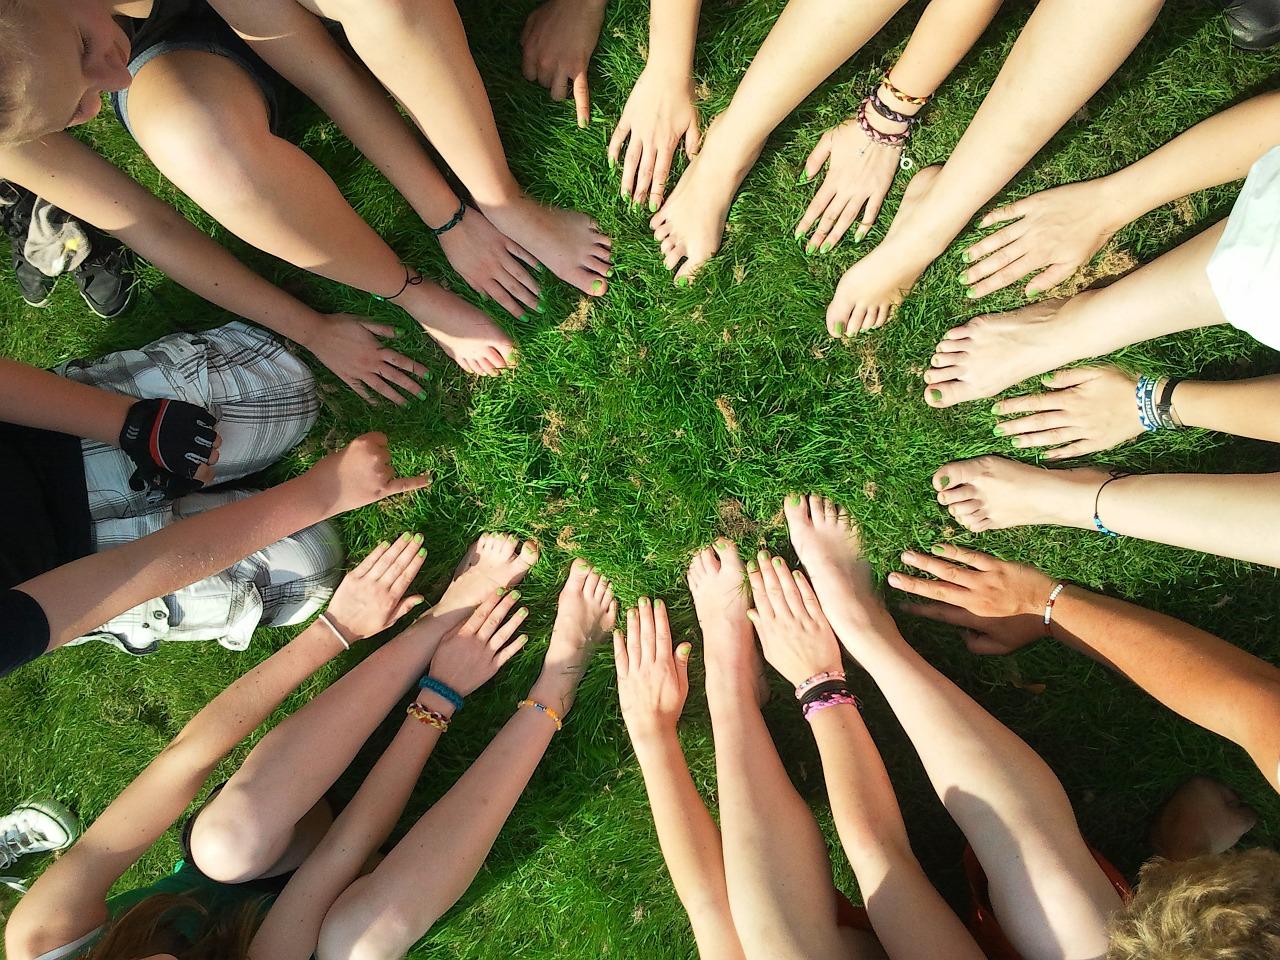 Quels sont les atouts d'un teambuilding?